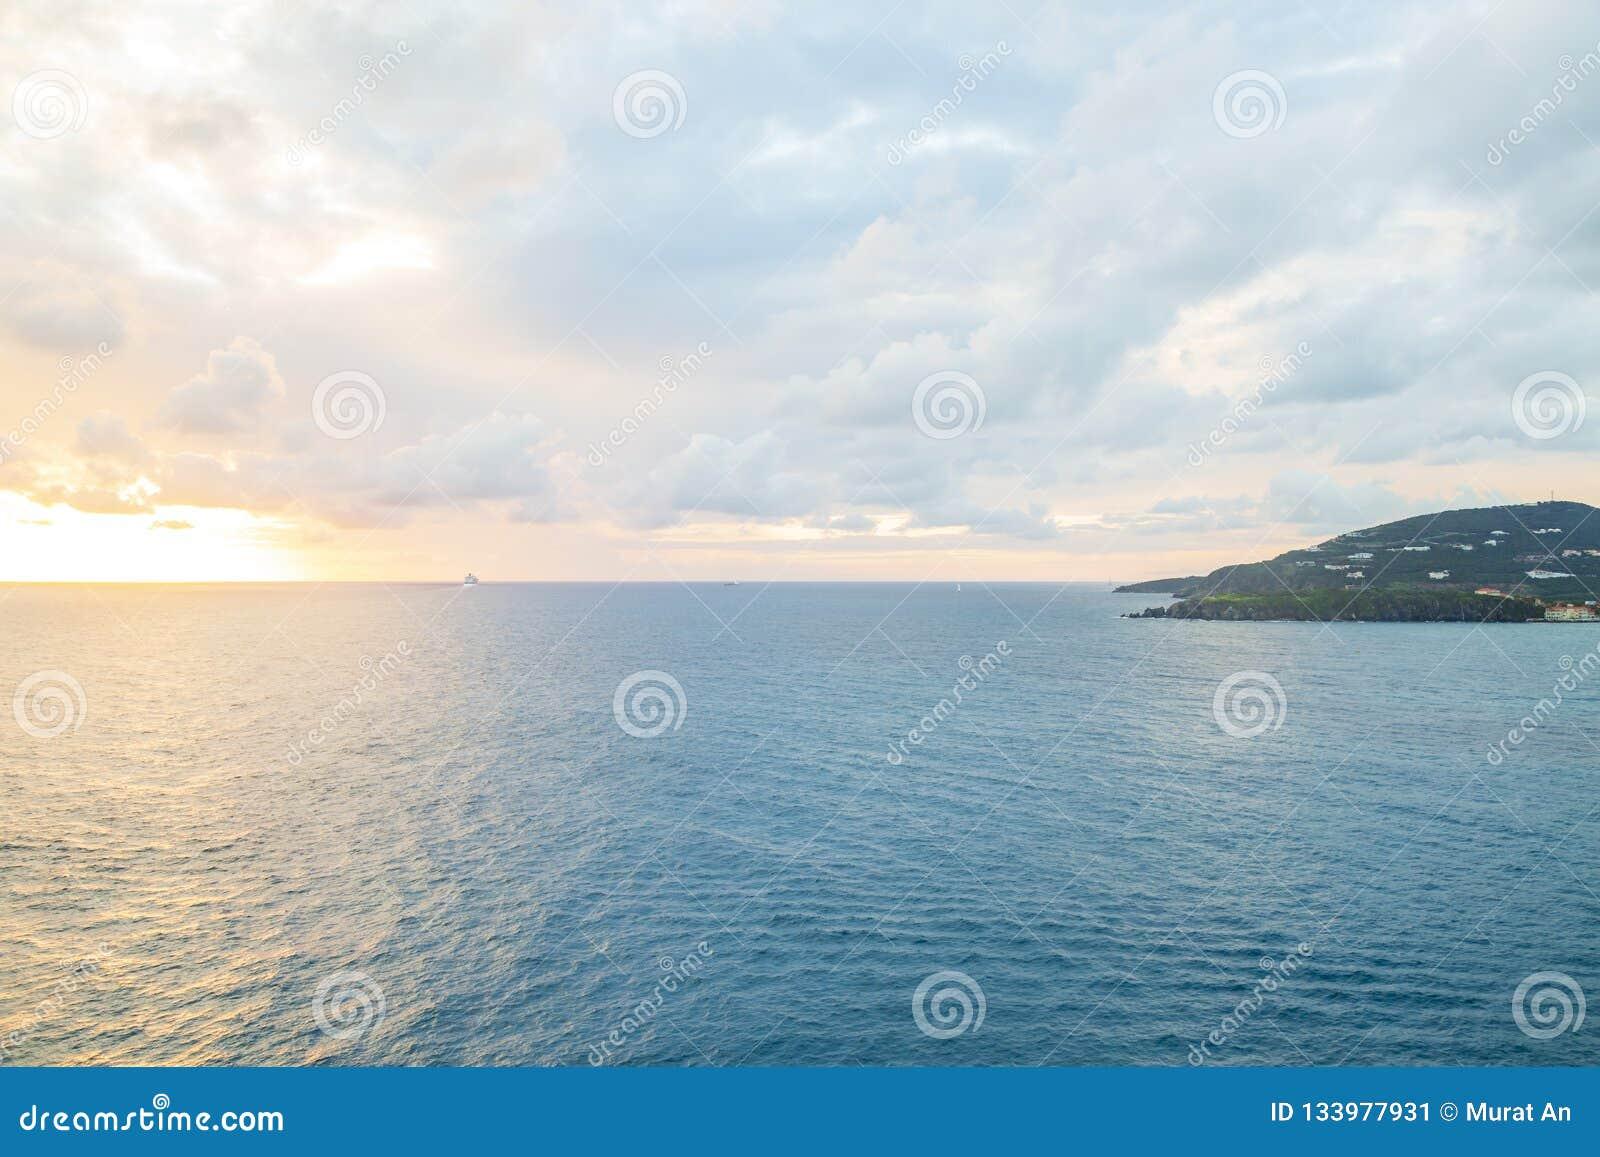 Bello tramonto in Philipsburg, isola della st Maarten nei Caraibi